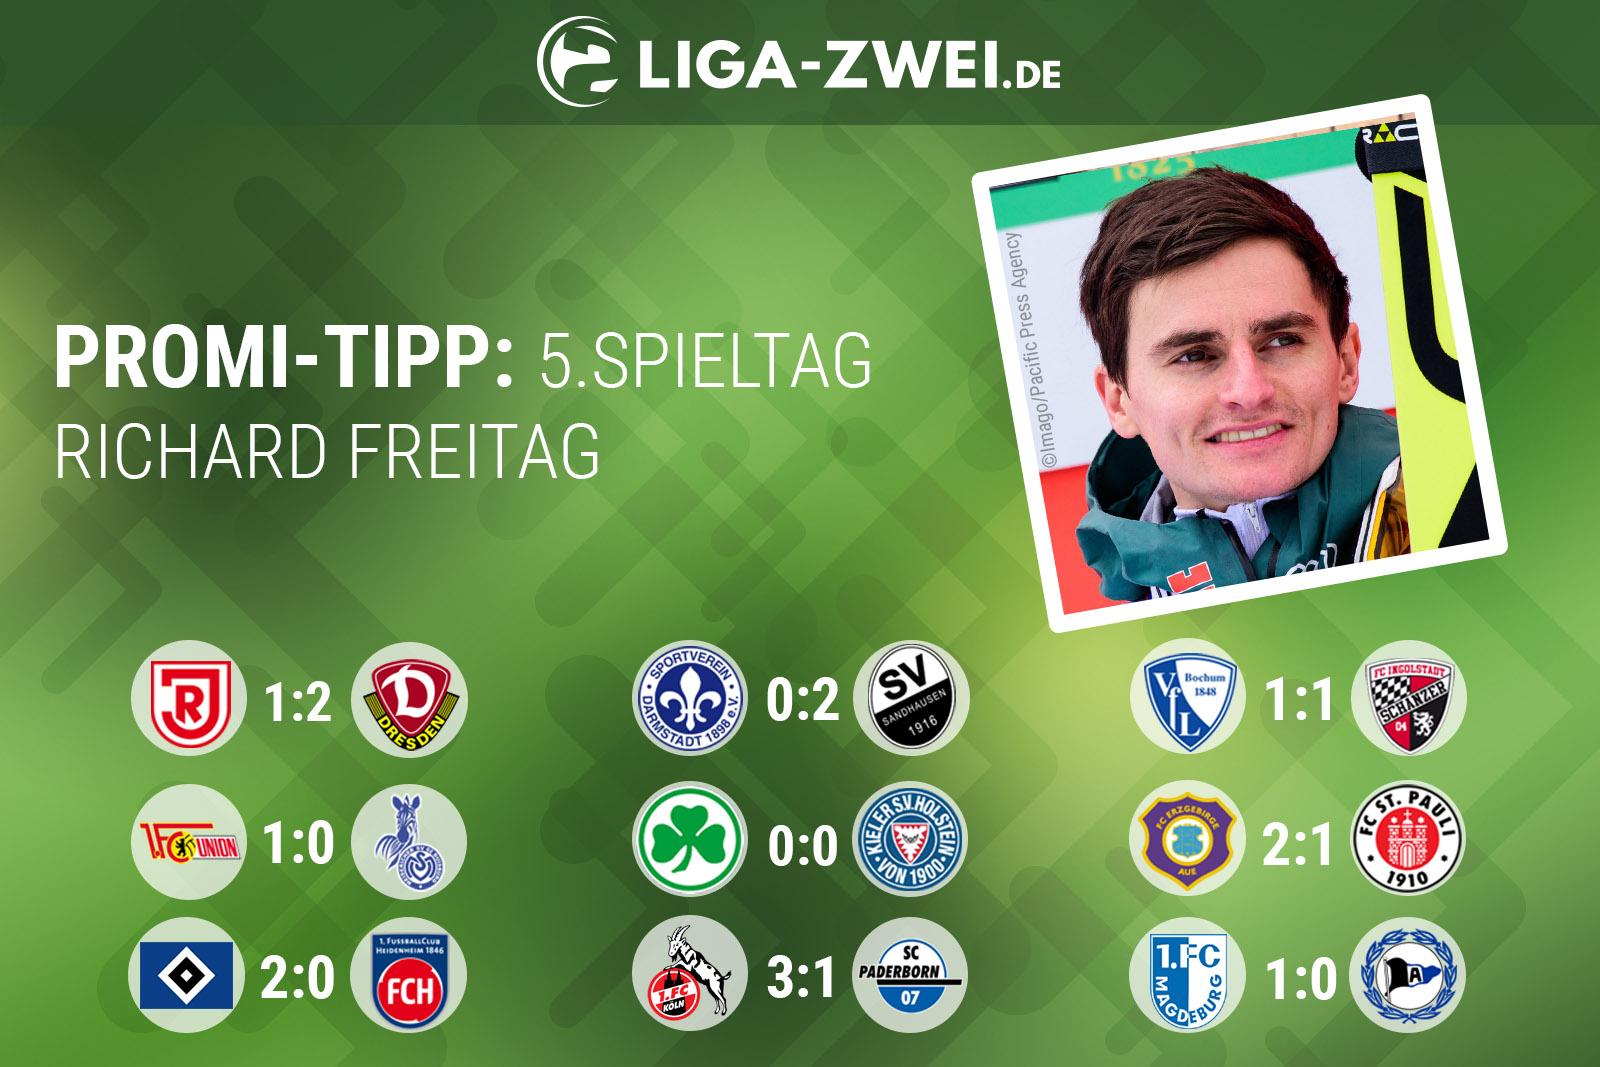 Richard Freitag beim Liga-Zwei.de Promi-Tipp